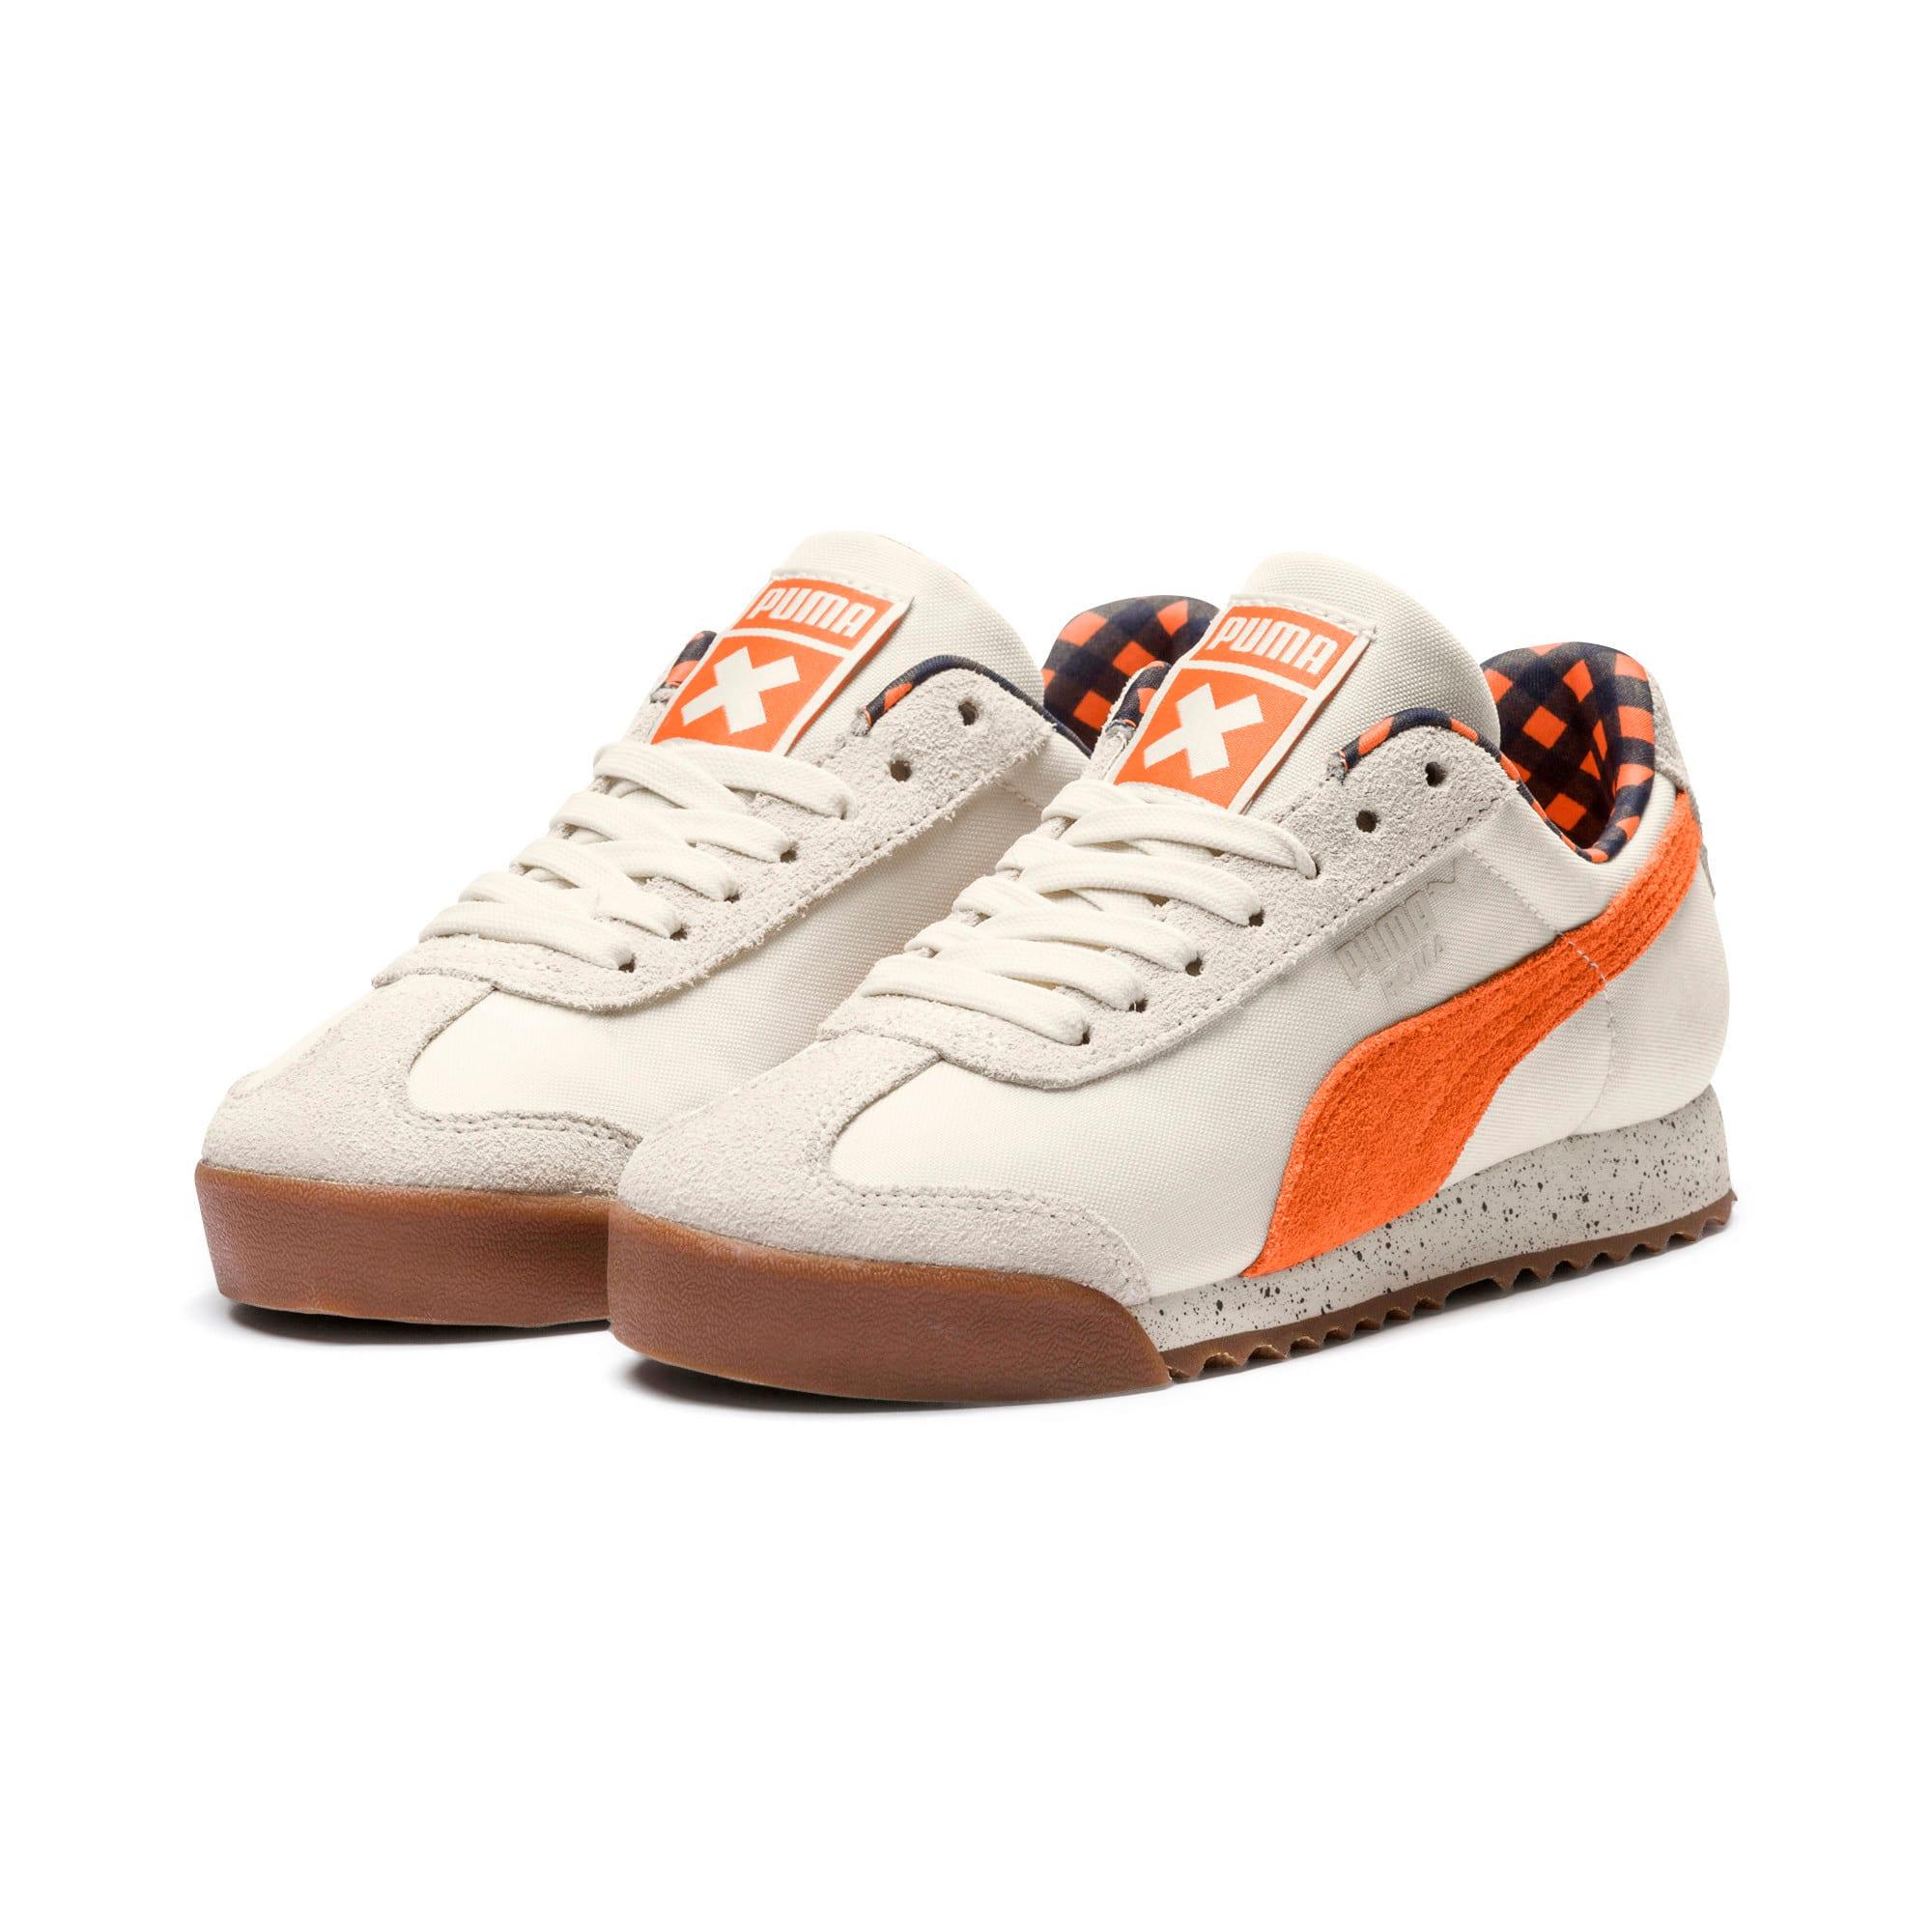 Thumbnail 2 of PUMA X TINYCOTTONS Roma Sneakers JR, White Asparagus-Orange-Blue, medium